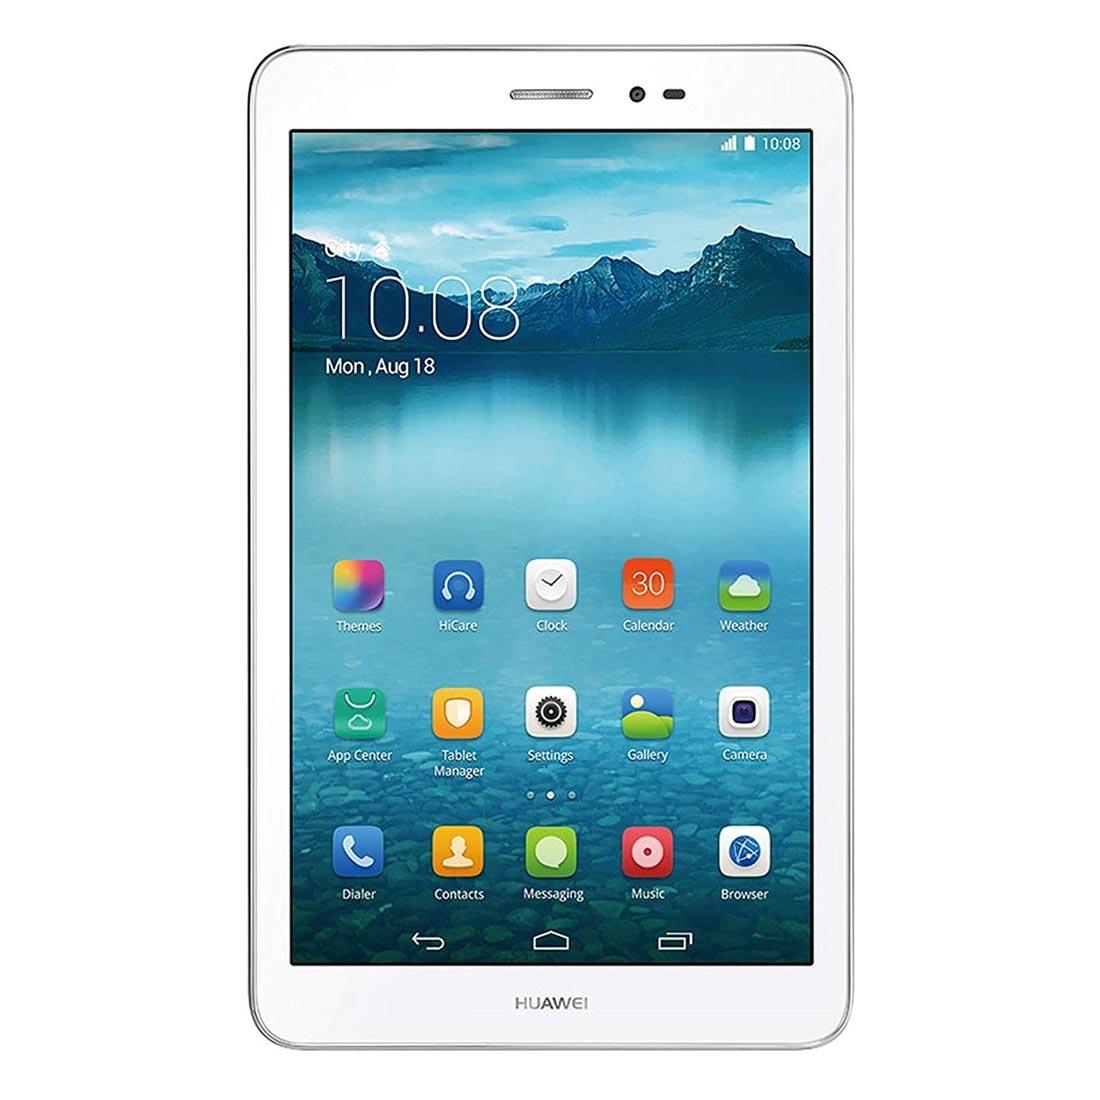 "Huawei MediaPad T1 8.0"" (8GB, Wifi) - Silver"